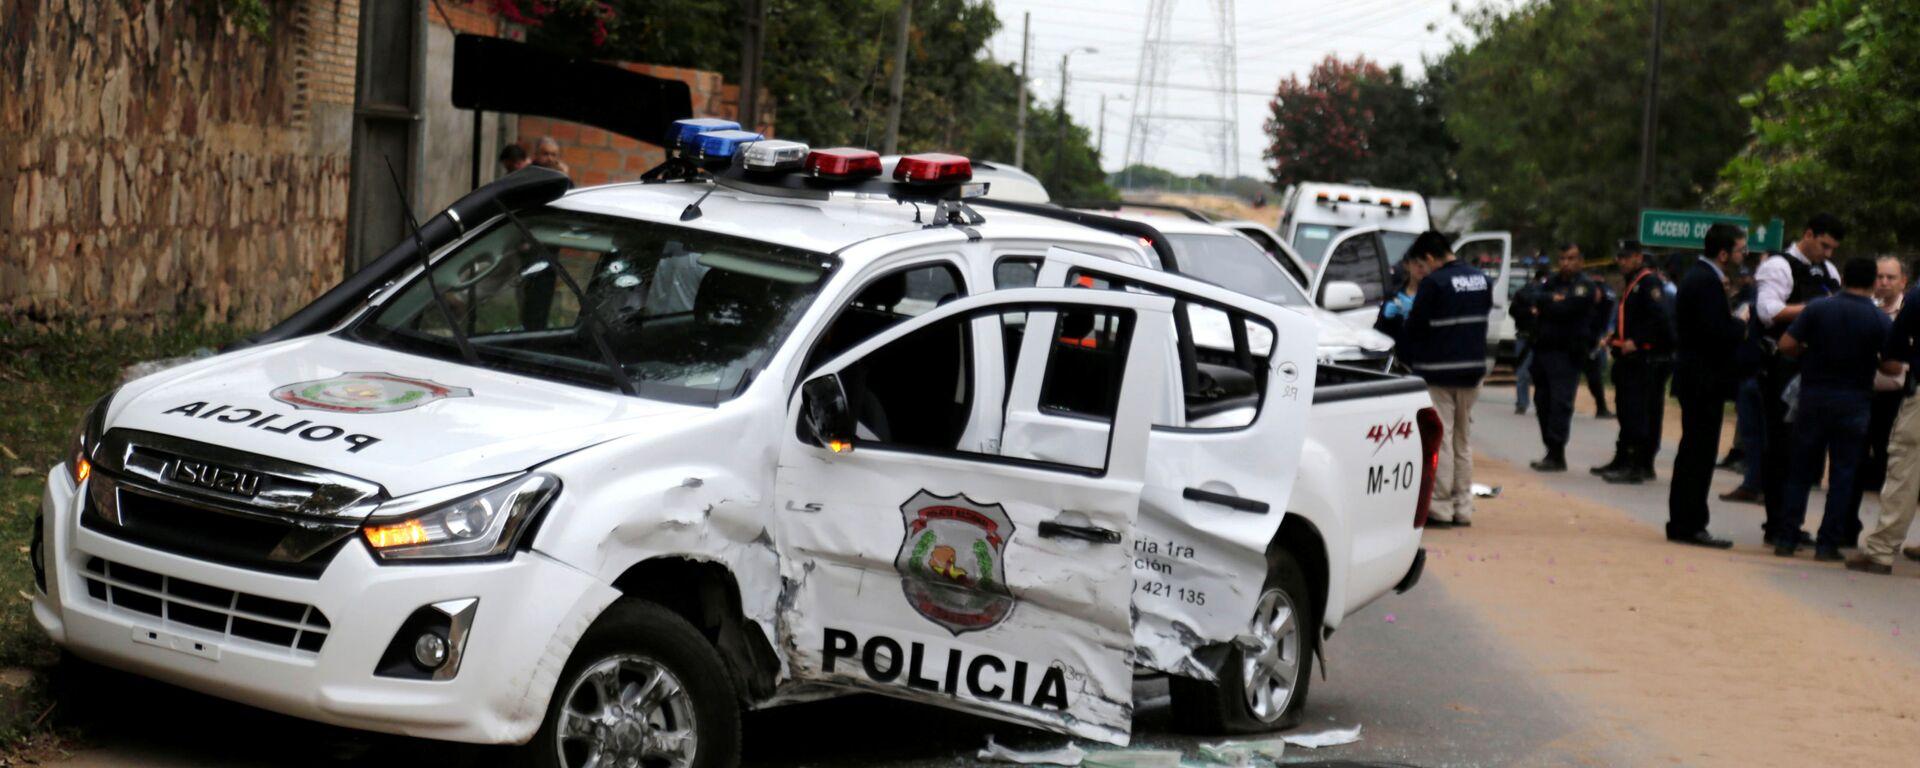 Camioneta policial destrozada tras el ataque de un grupo criminal para liberar al líder narco Teófilo Samudio - Sputnik Mundo, 1920, 12.09.2019